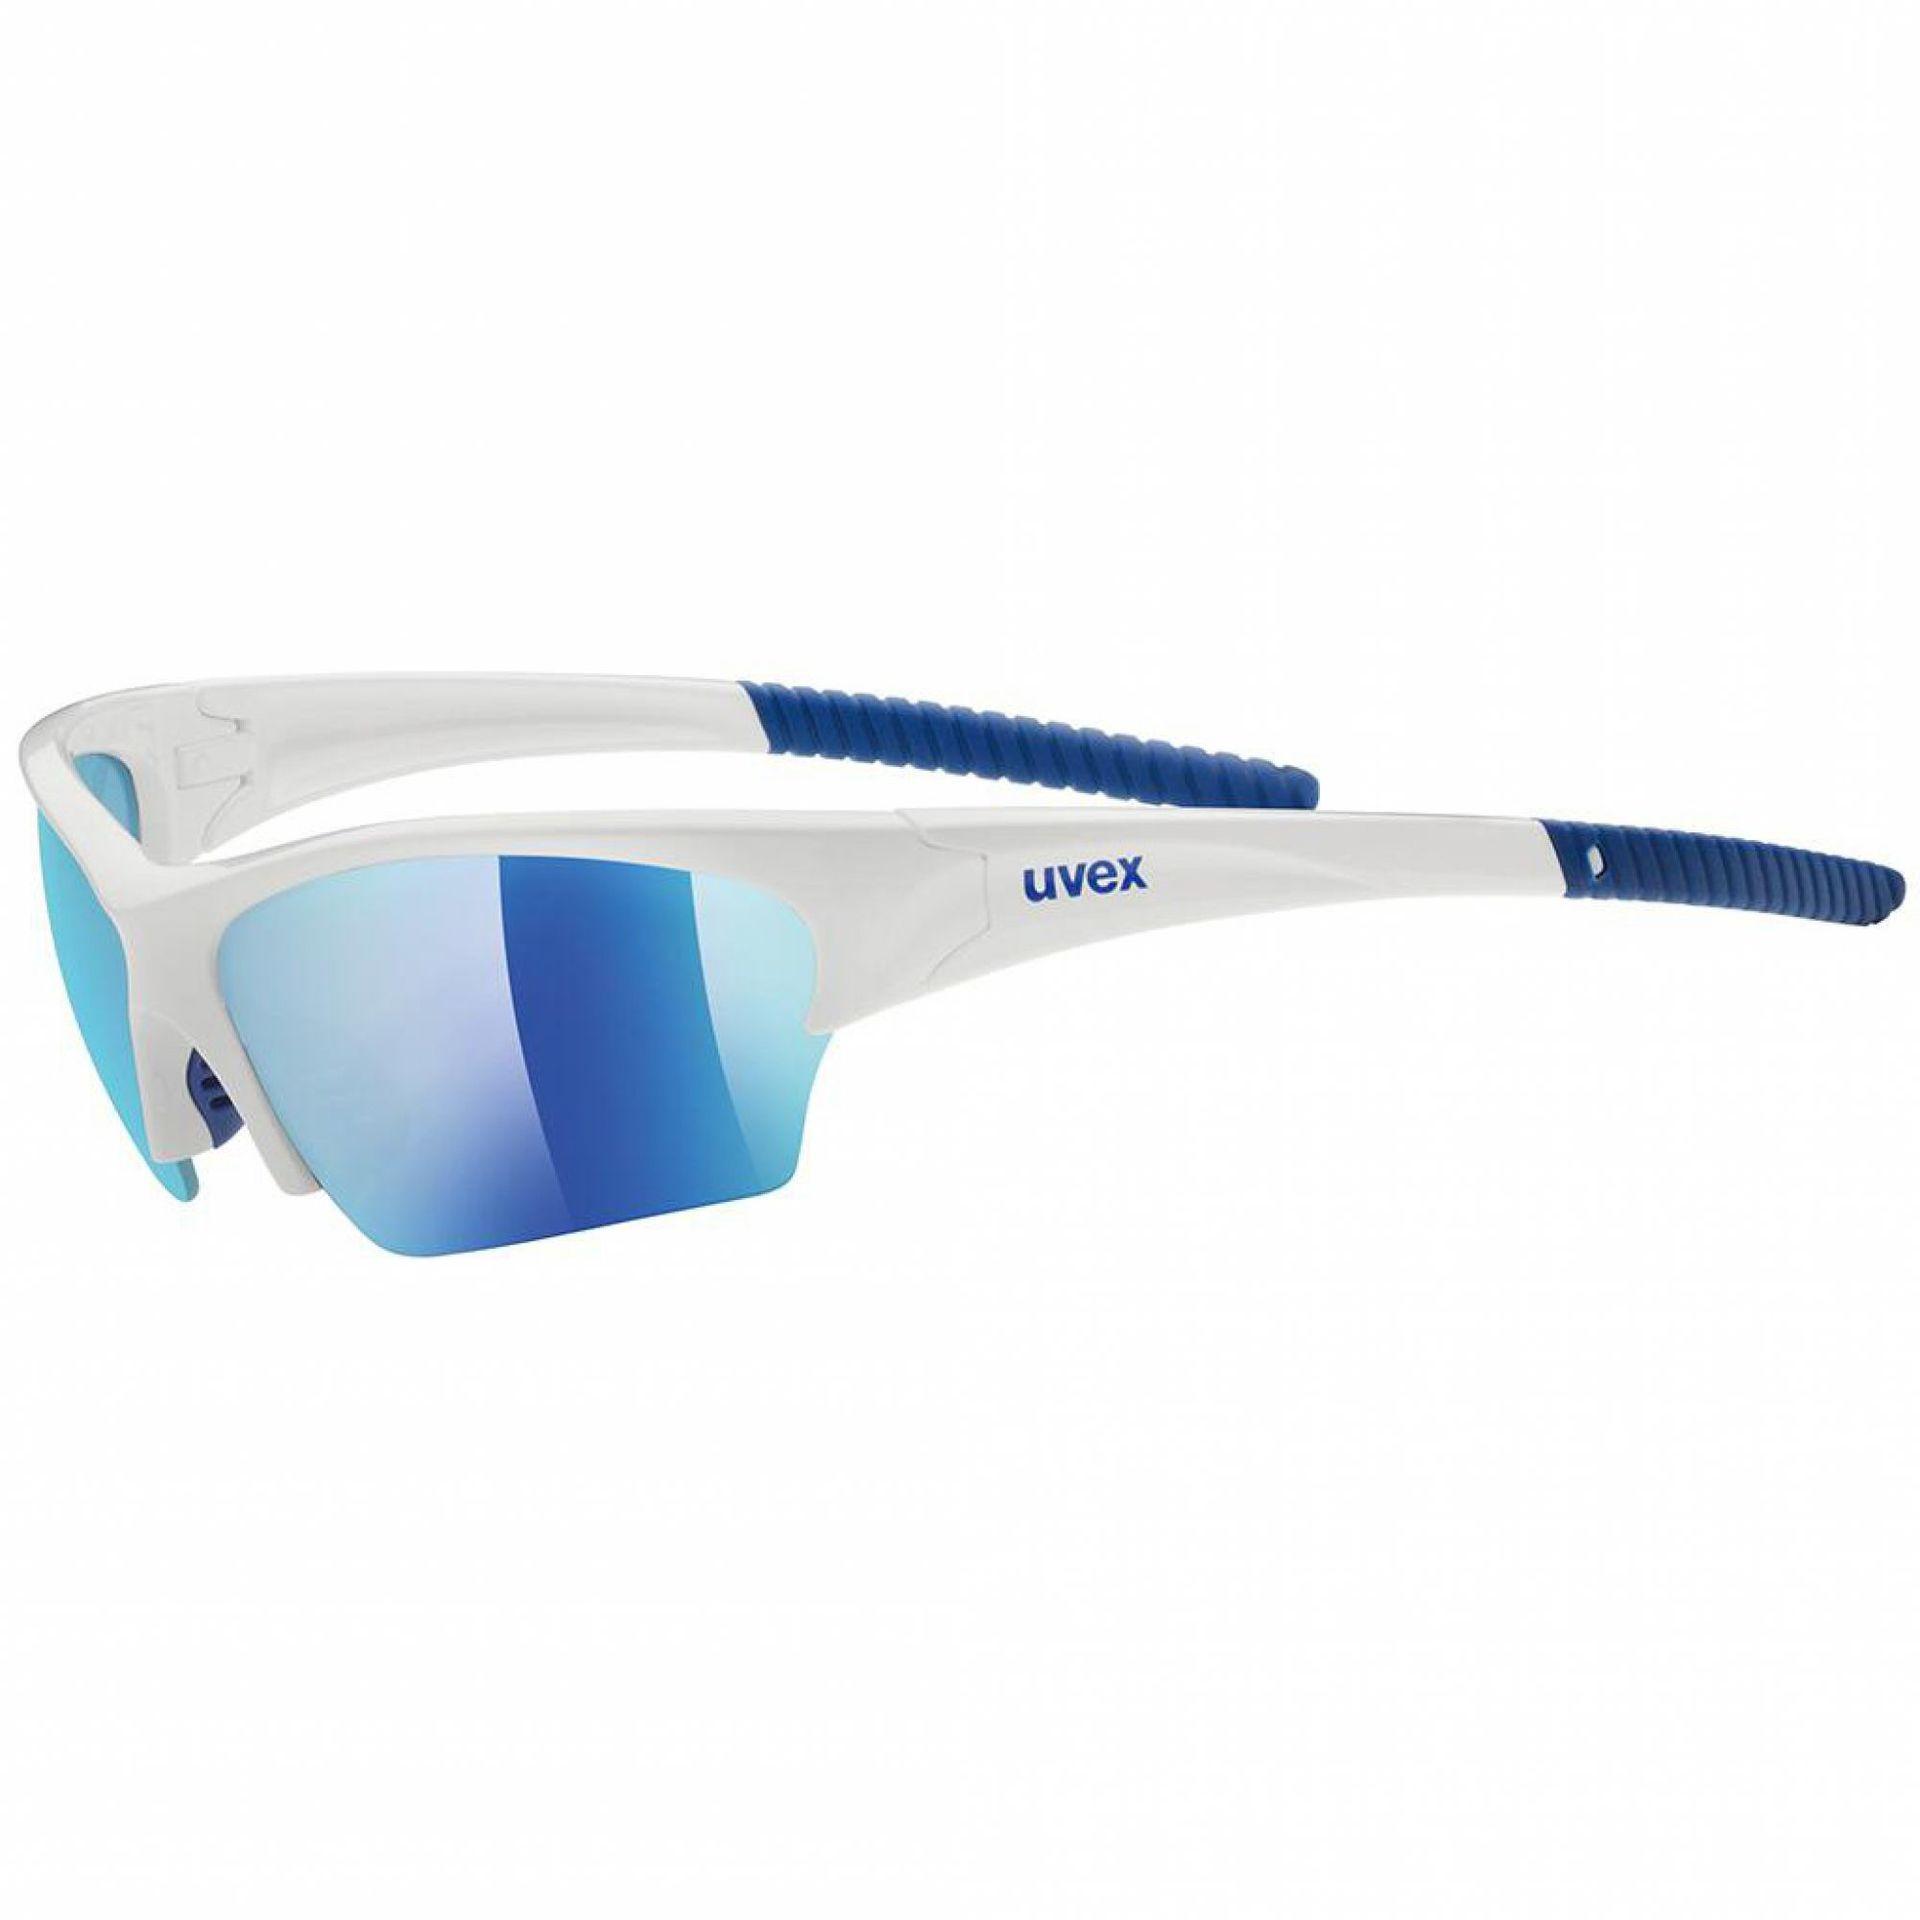 OKULARY UVEX SUNSATION WHITE BLUE